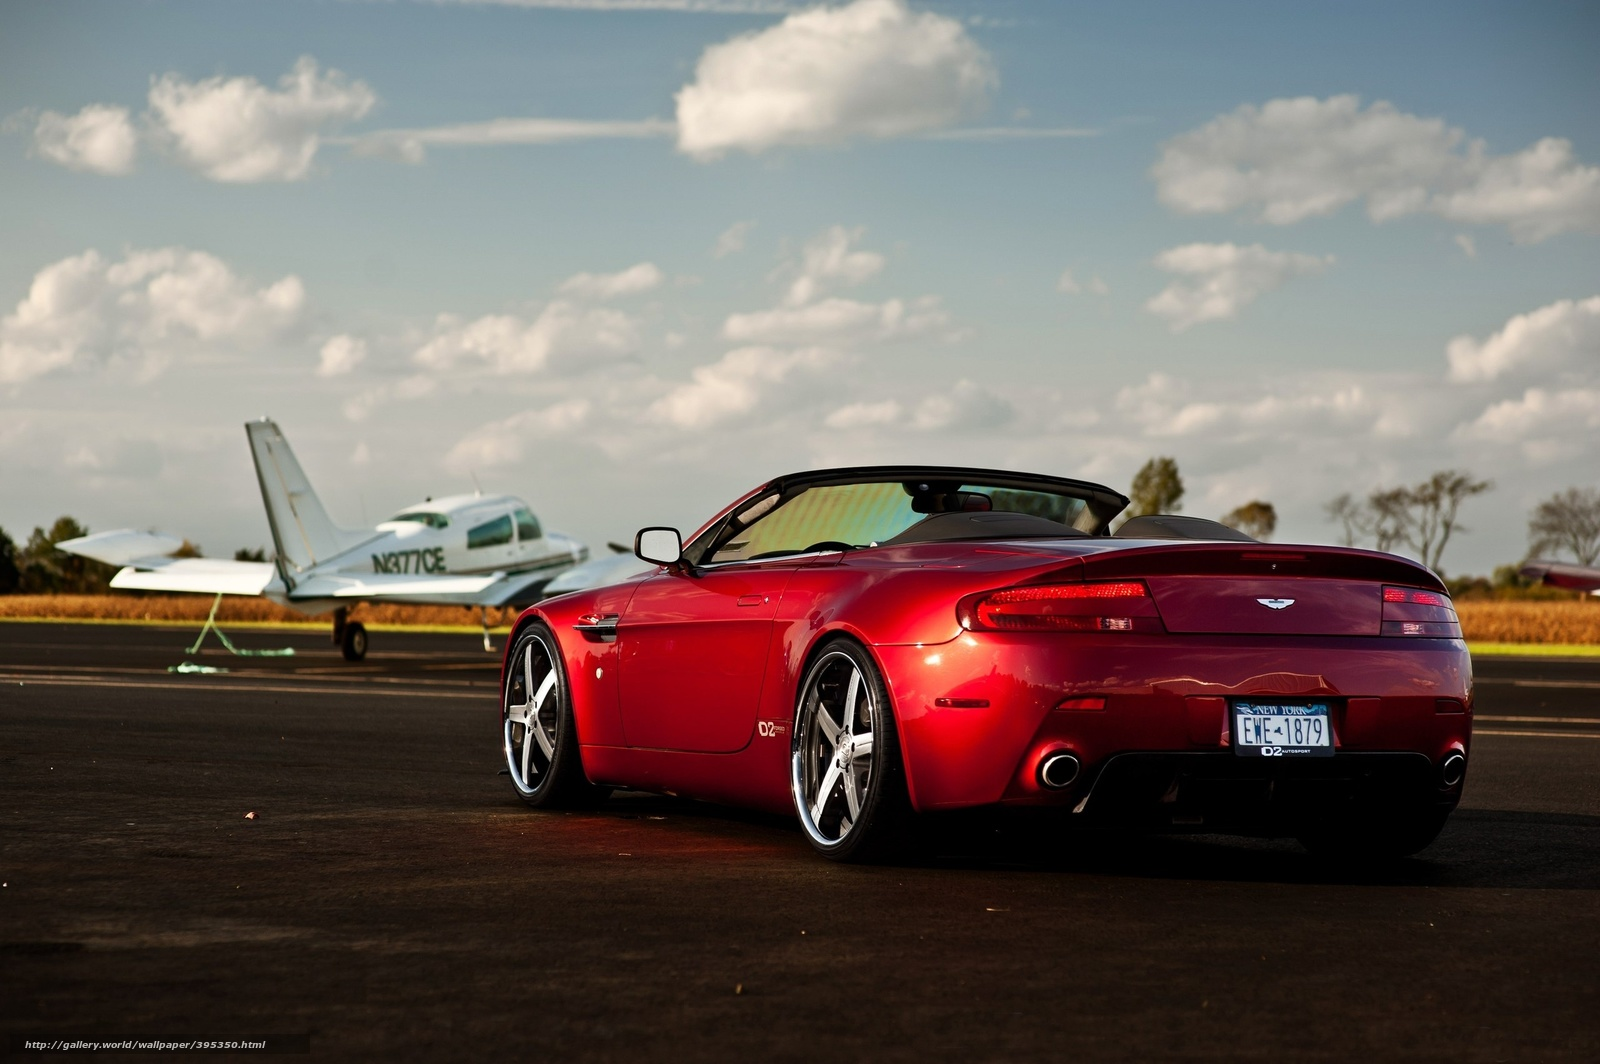 Download wallpaper Aston Martin,  wheelbarrow,  red,  cars free desktop wallpaper in the resolution 2560x1703 — picture №395350